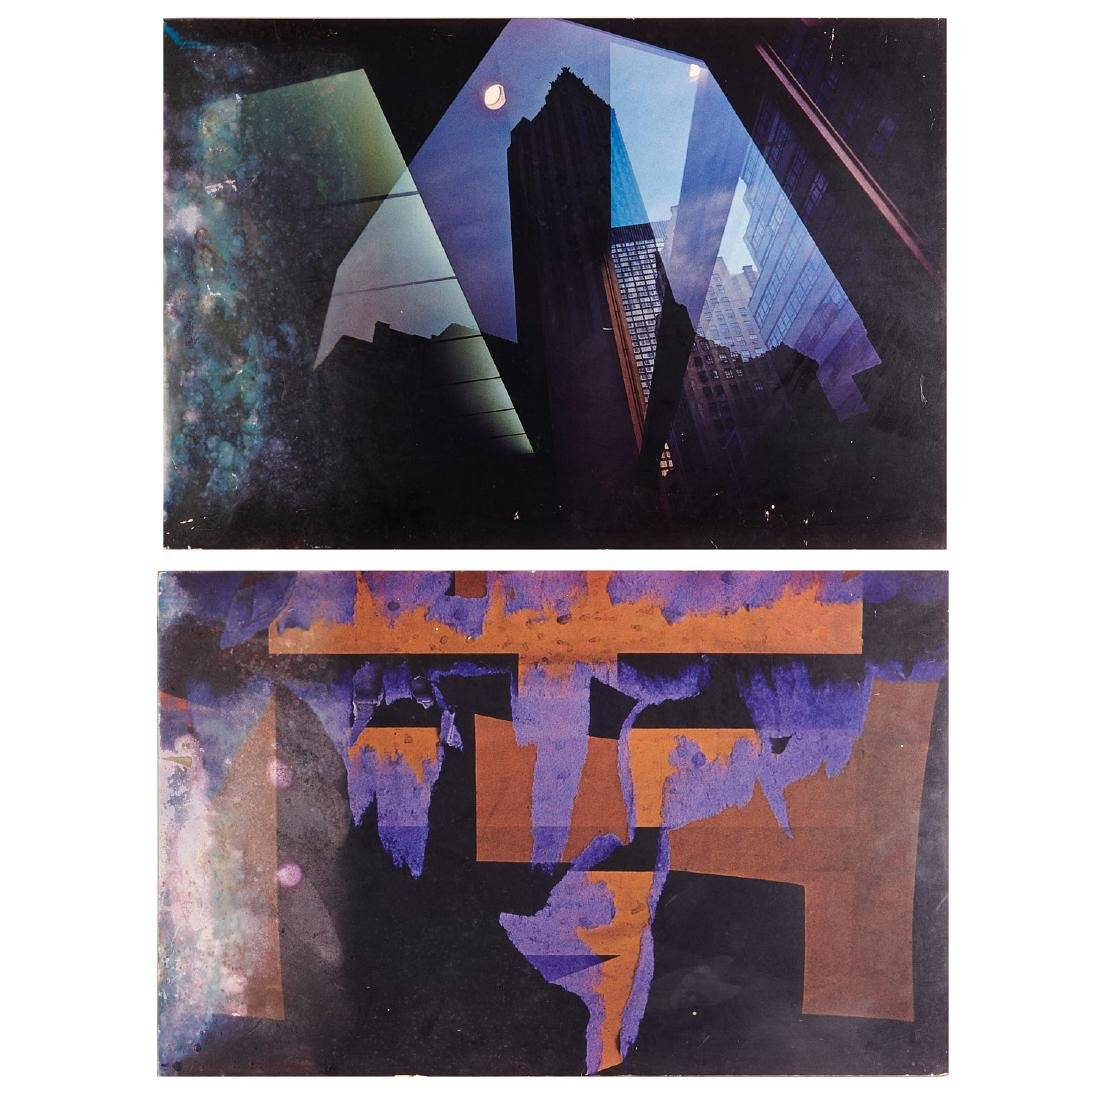 Ernst Haas, (2) Photographs, 1969